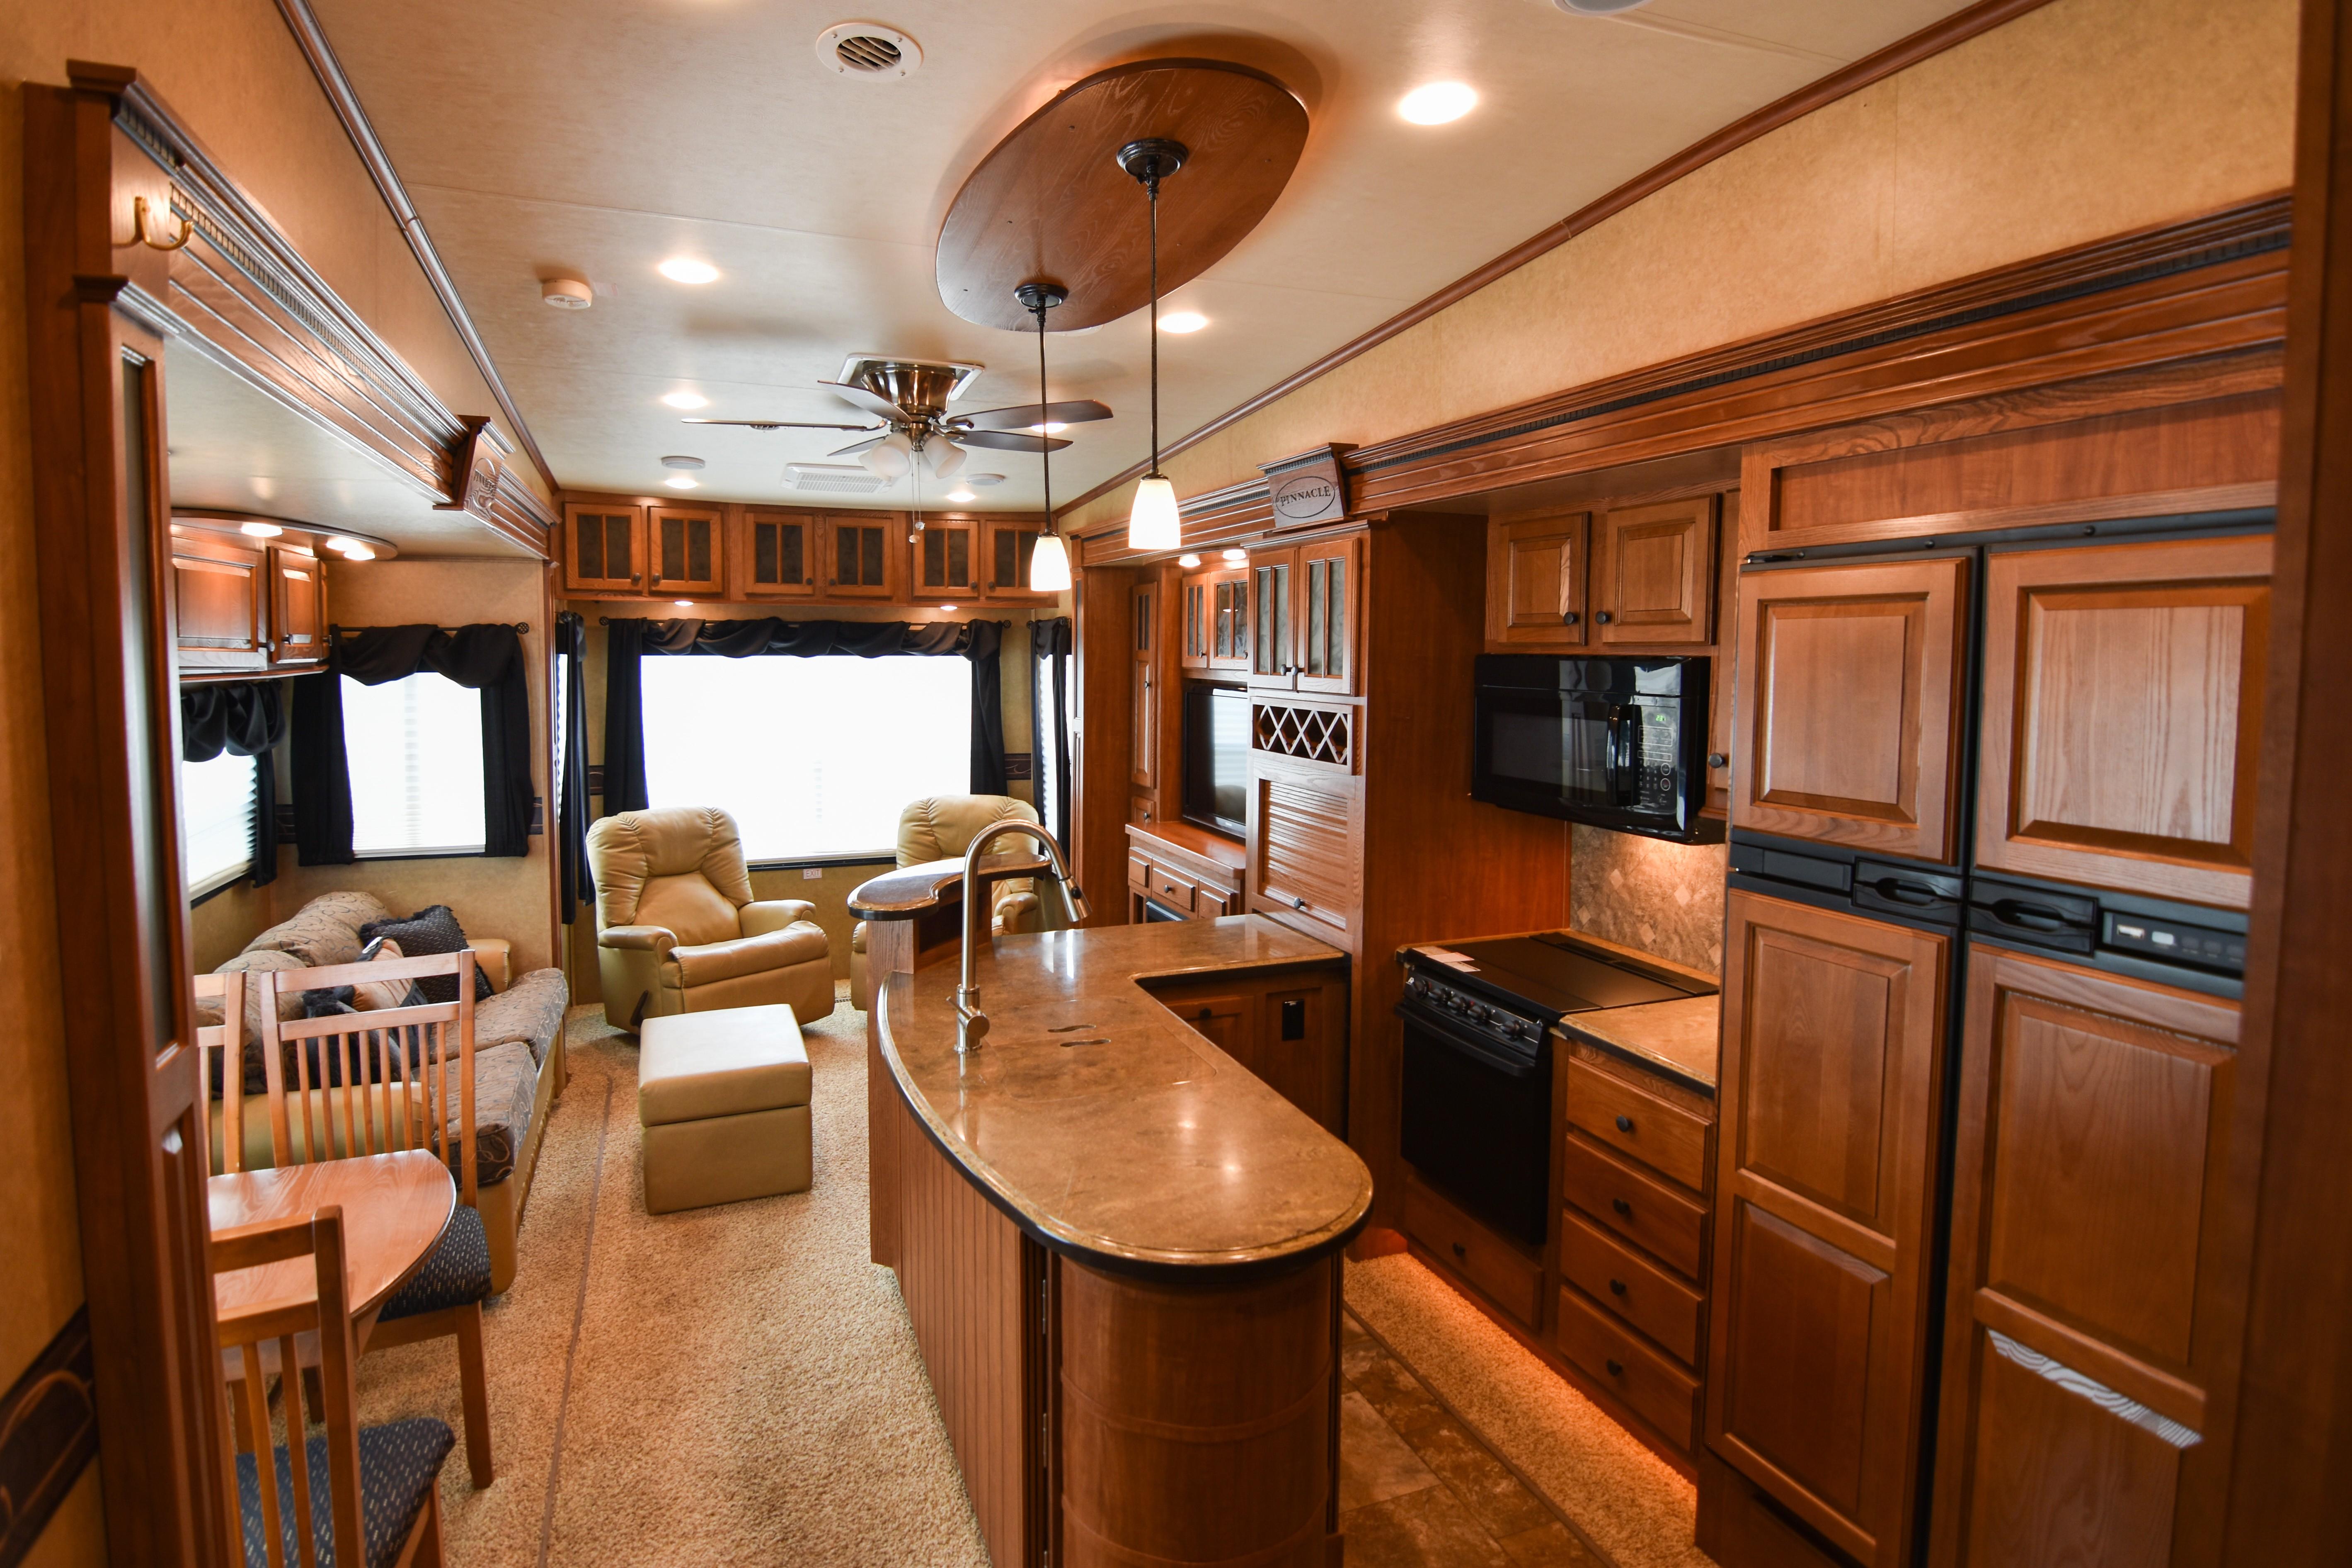 Used 2013 Jayco Pinnacle 35LKTS in Mesa, AZ